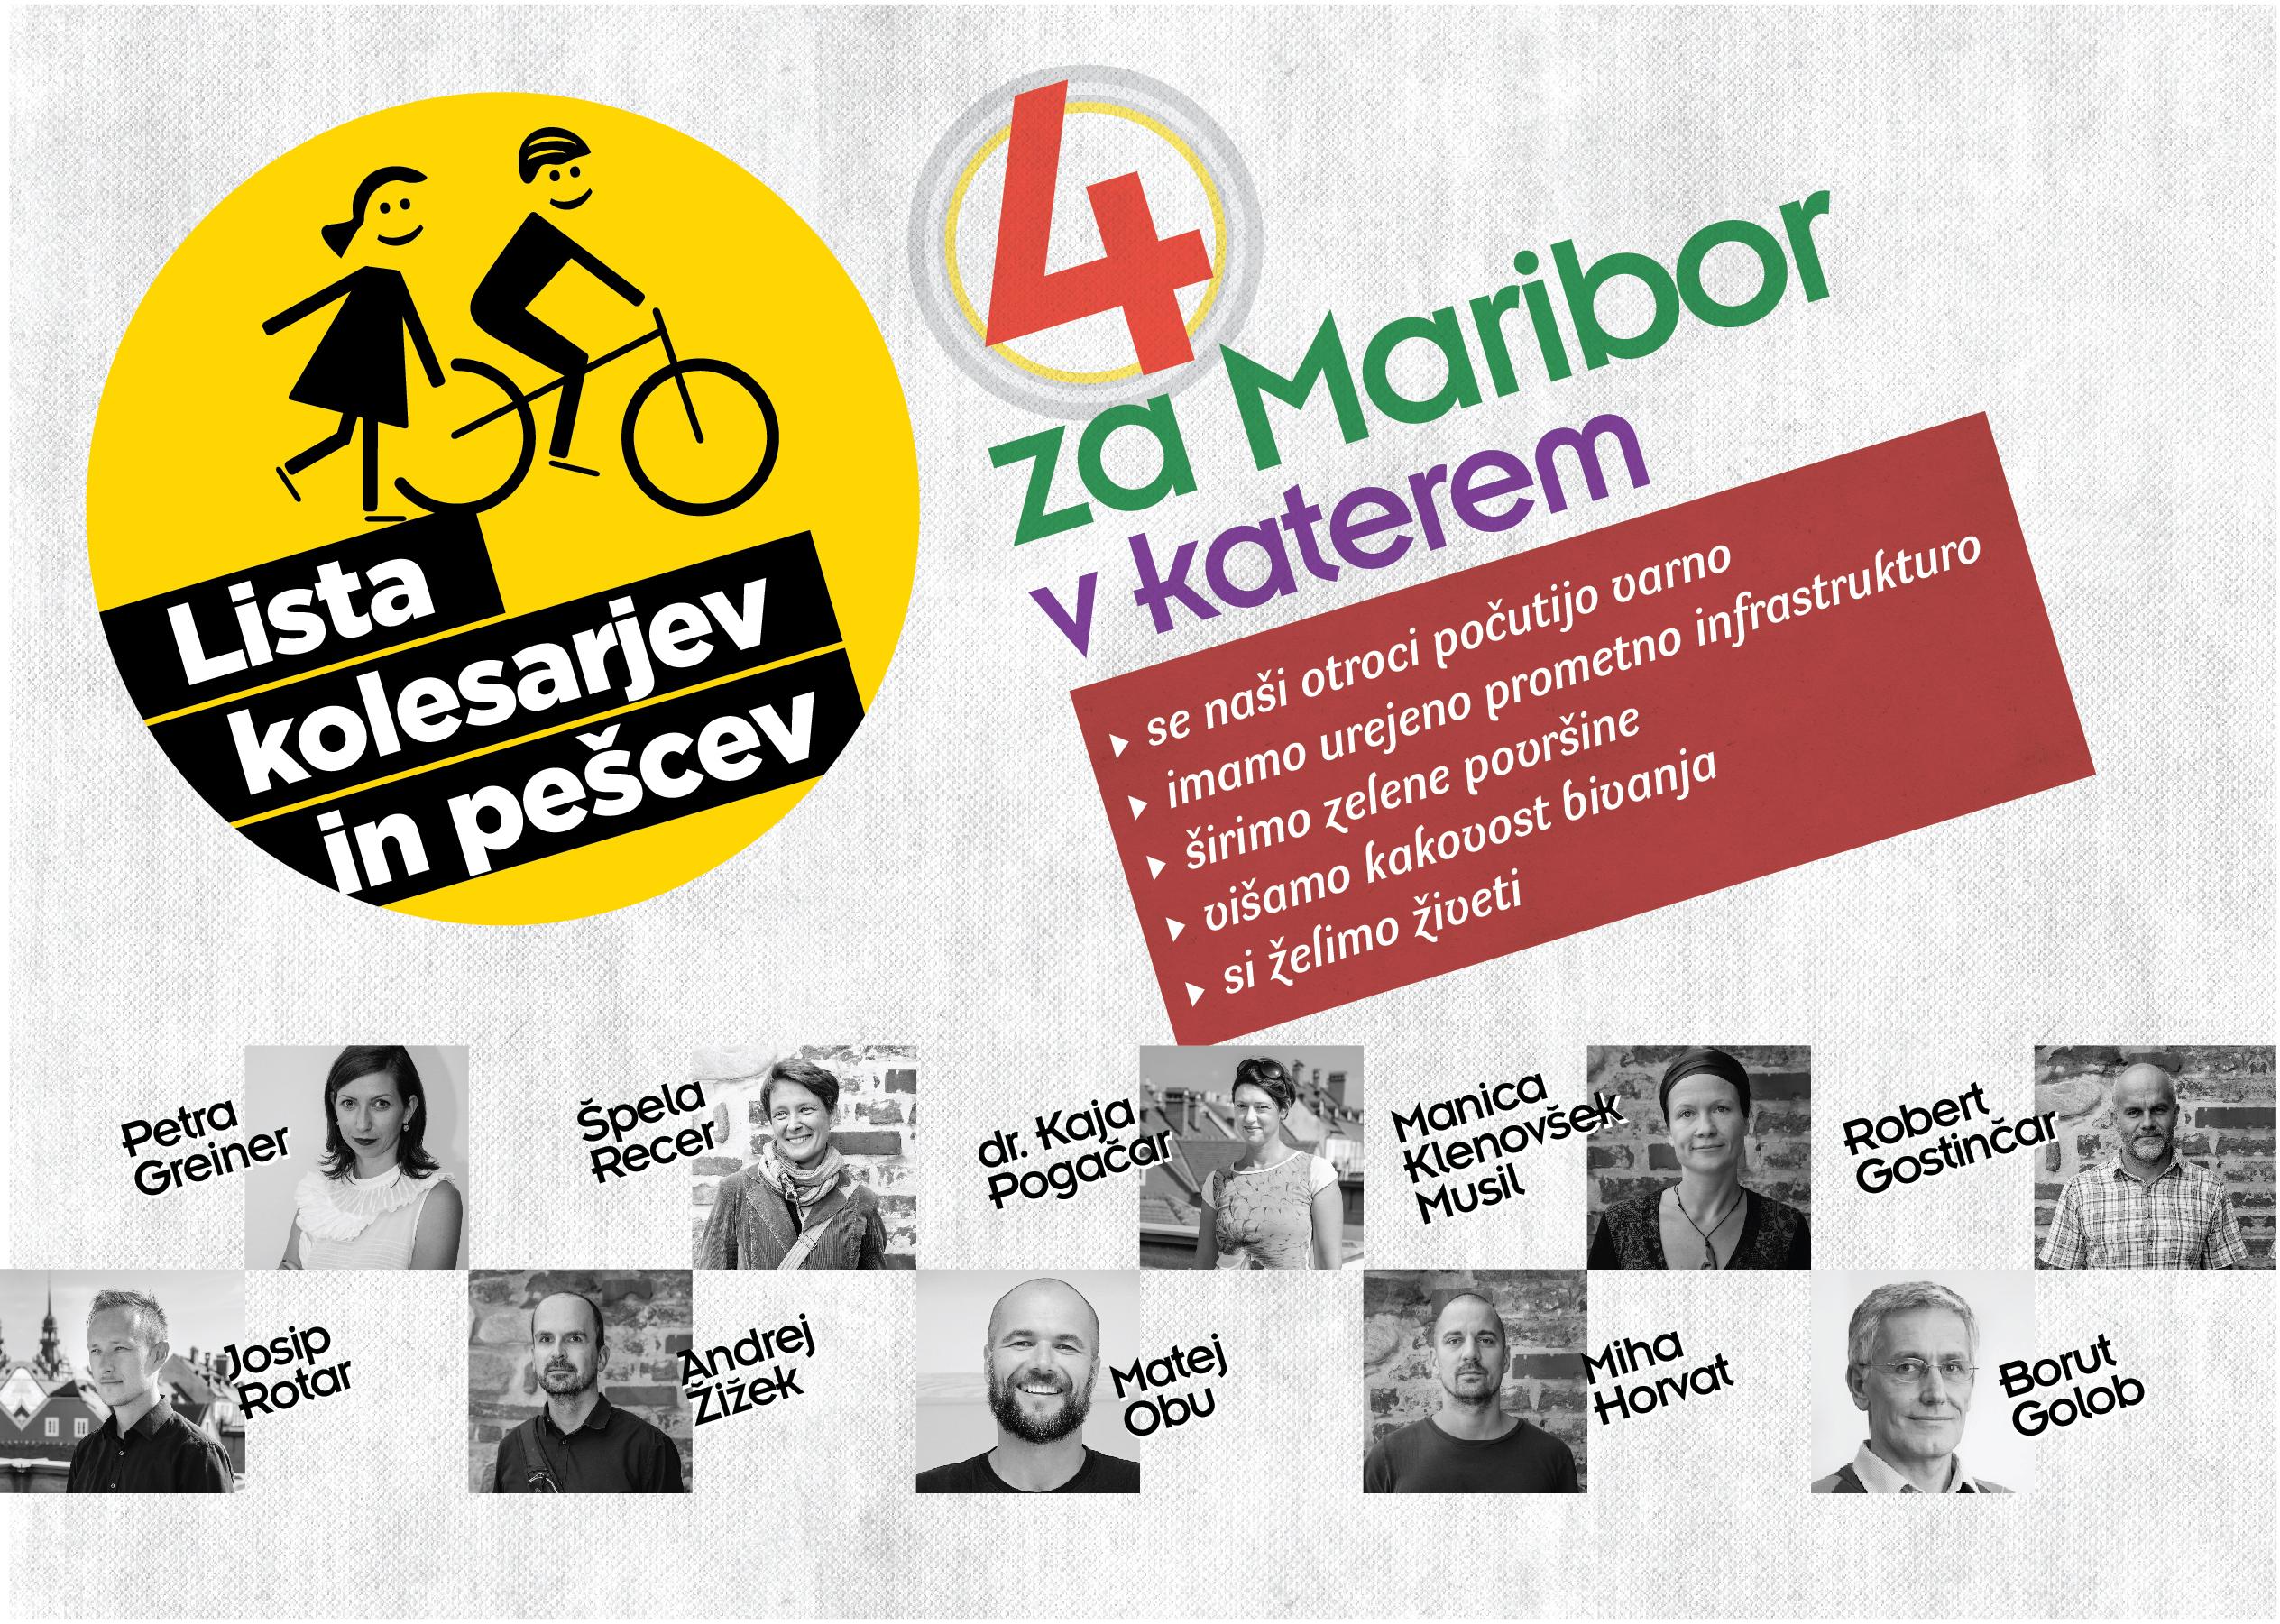 Lista-kolesarjev-in-pešcev-kandidati-2014